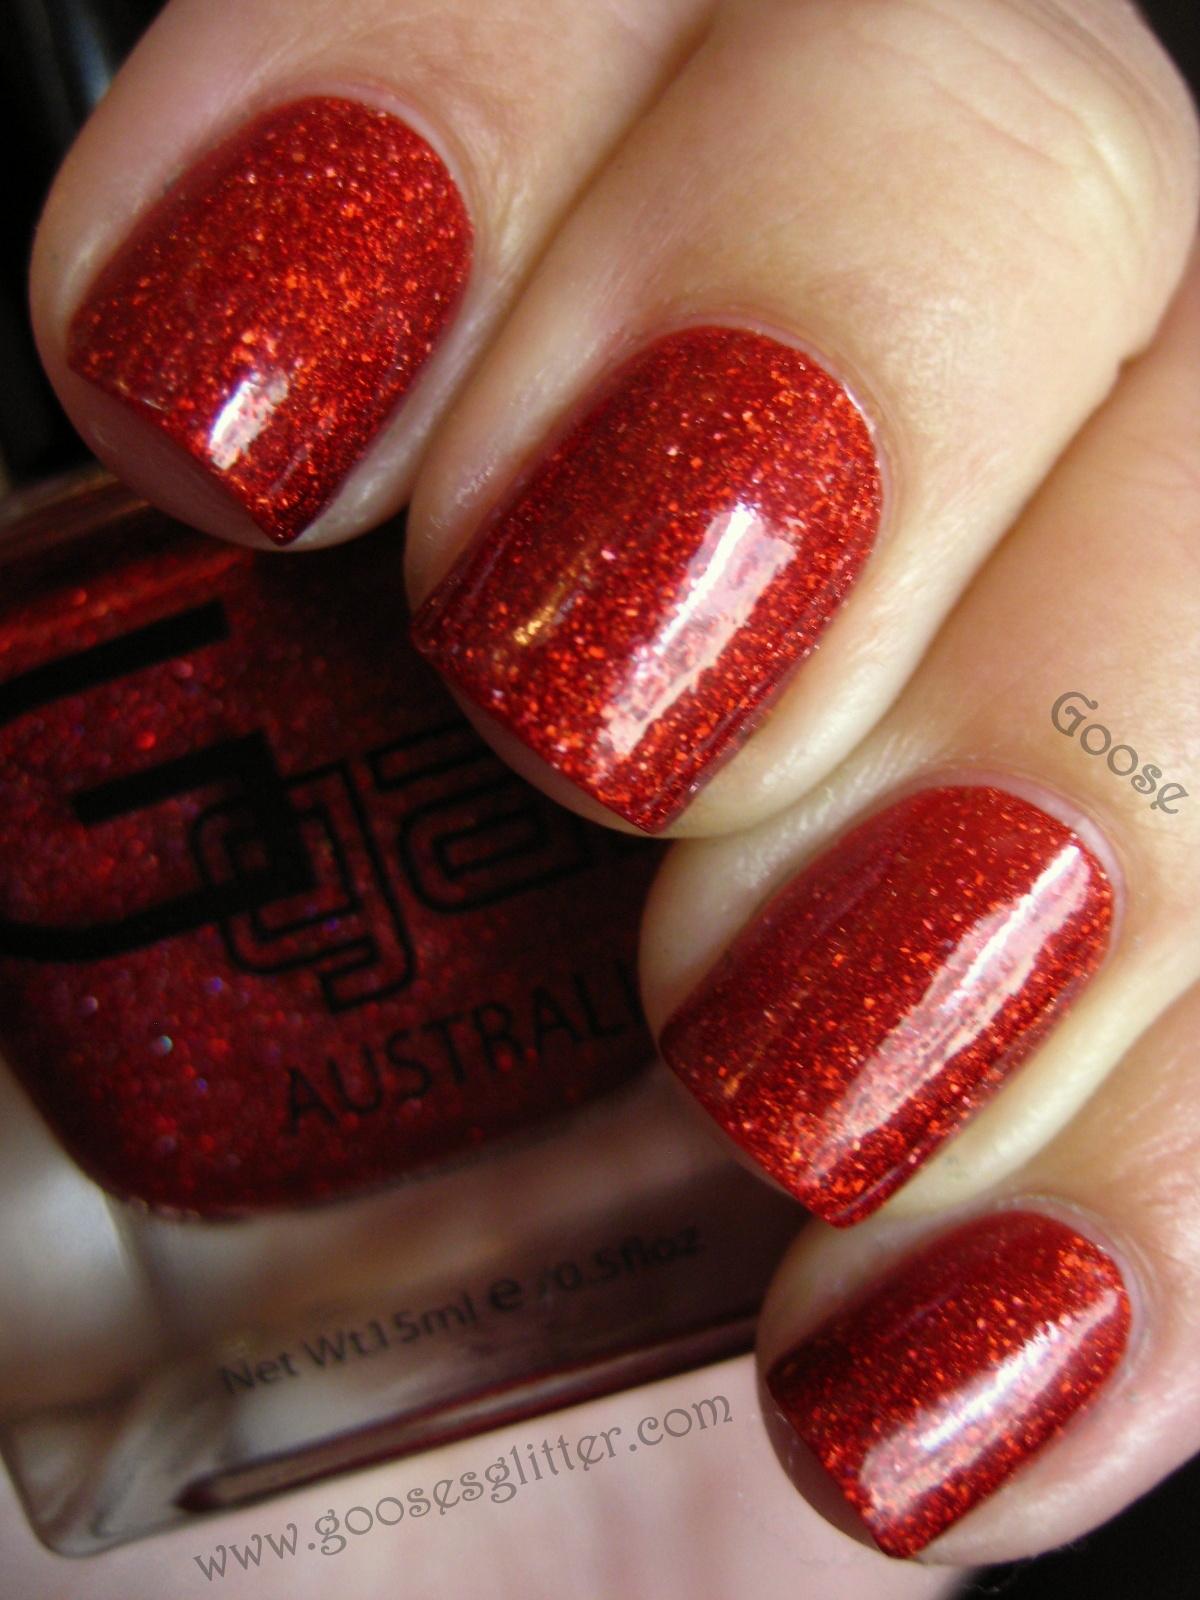 Goose\'s Glitter: Happy Valentine\'s Day & Glitter Gal - Type O